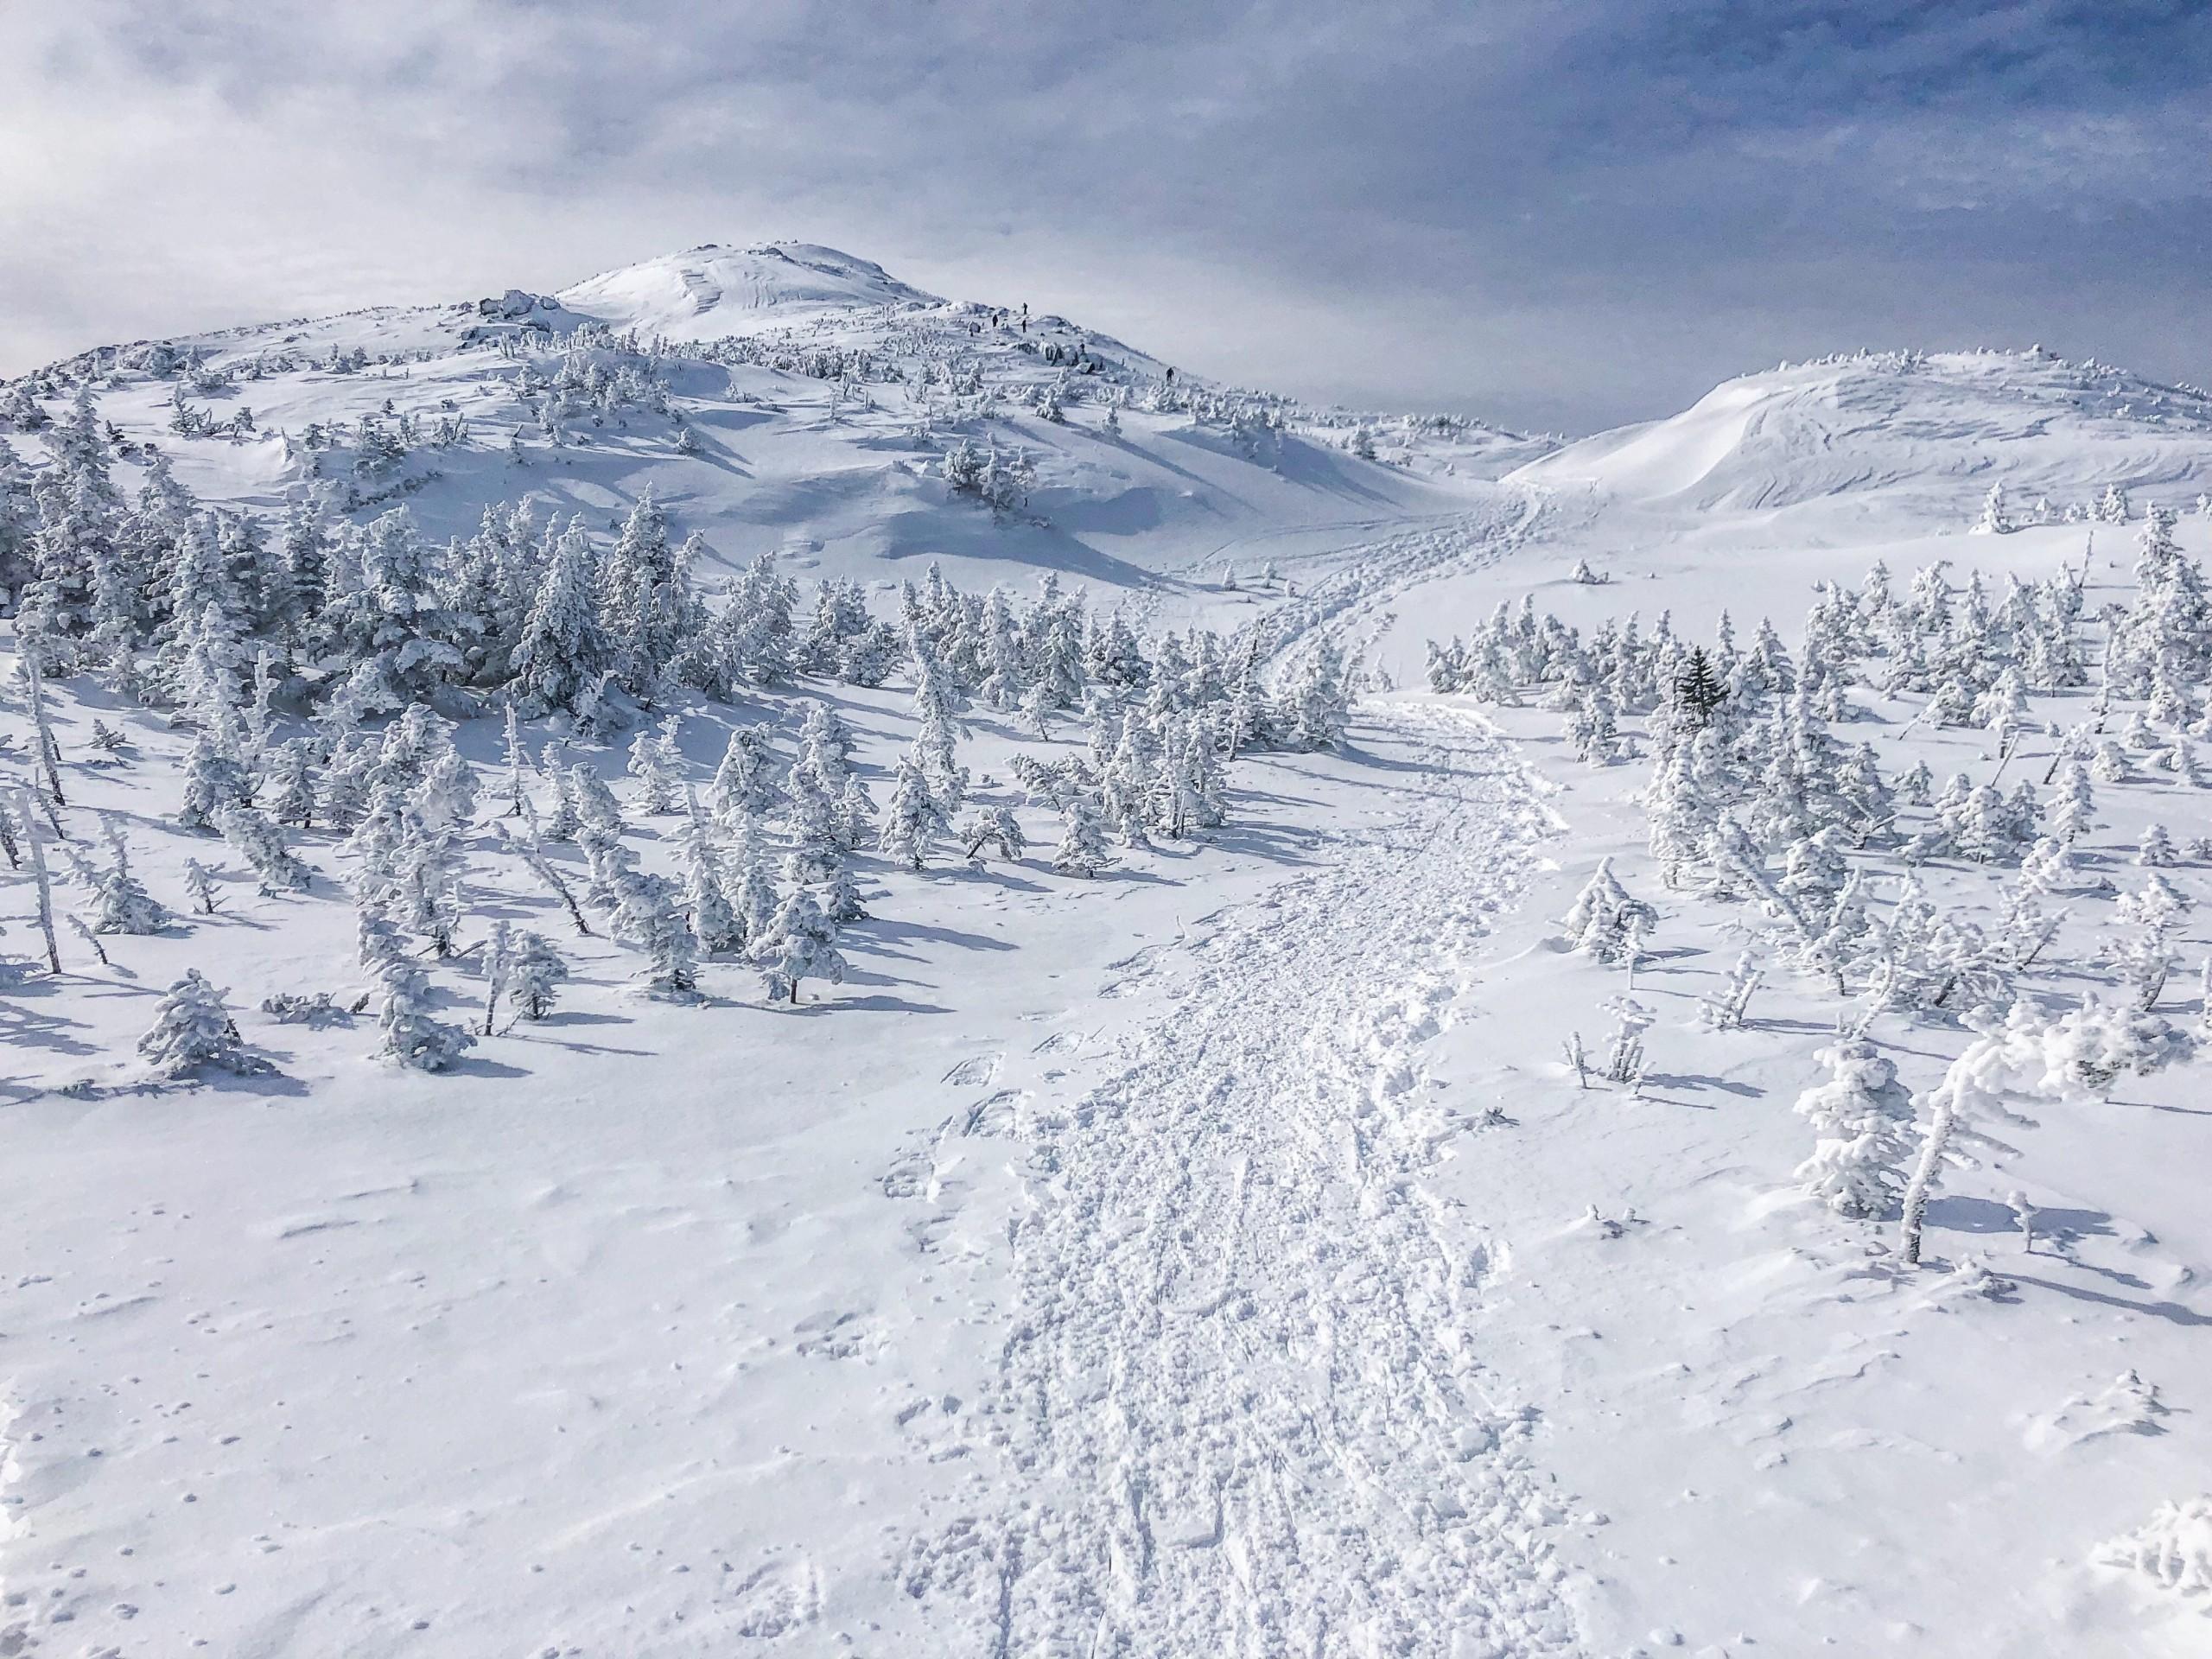 A snowy mountain summit